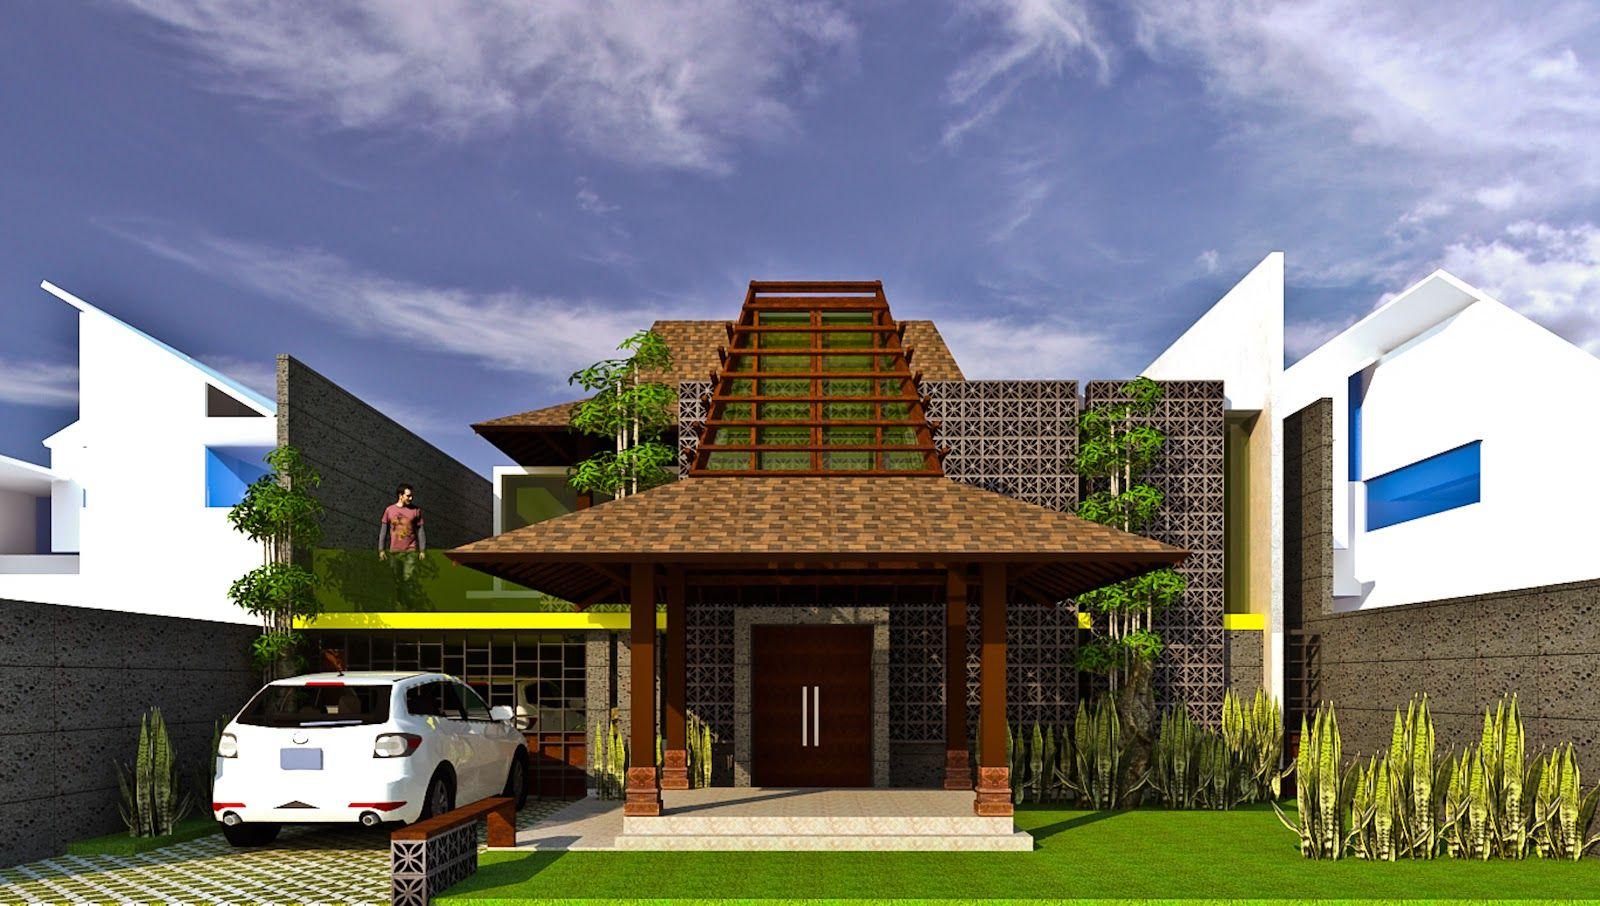 45 Desain Rumah Joglo Khas Jawa Tengah Desainrumahnya Com Tips